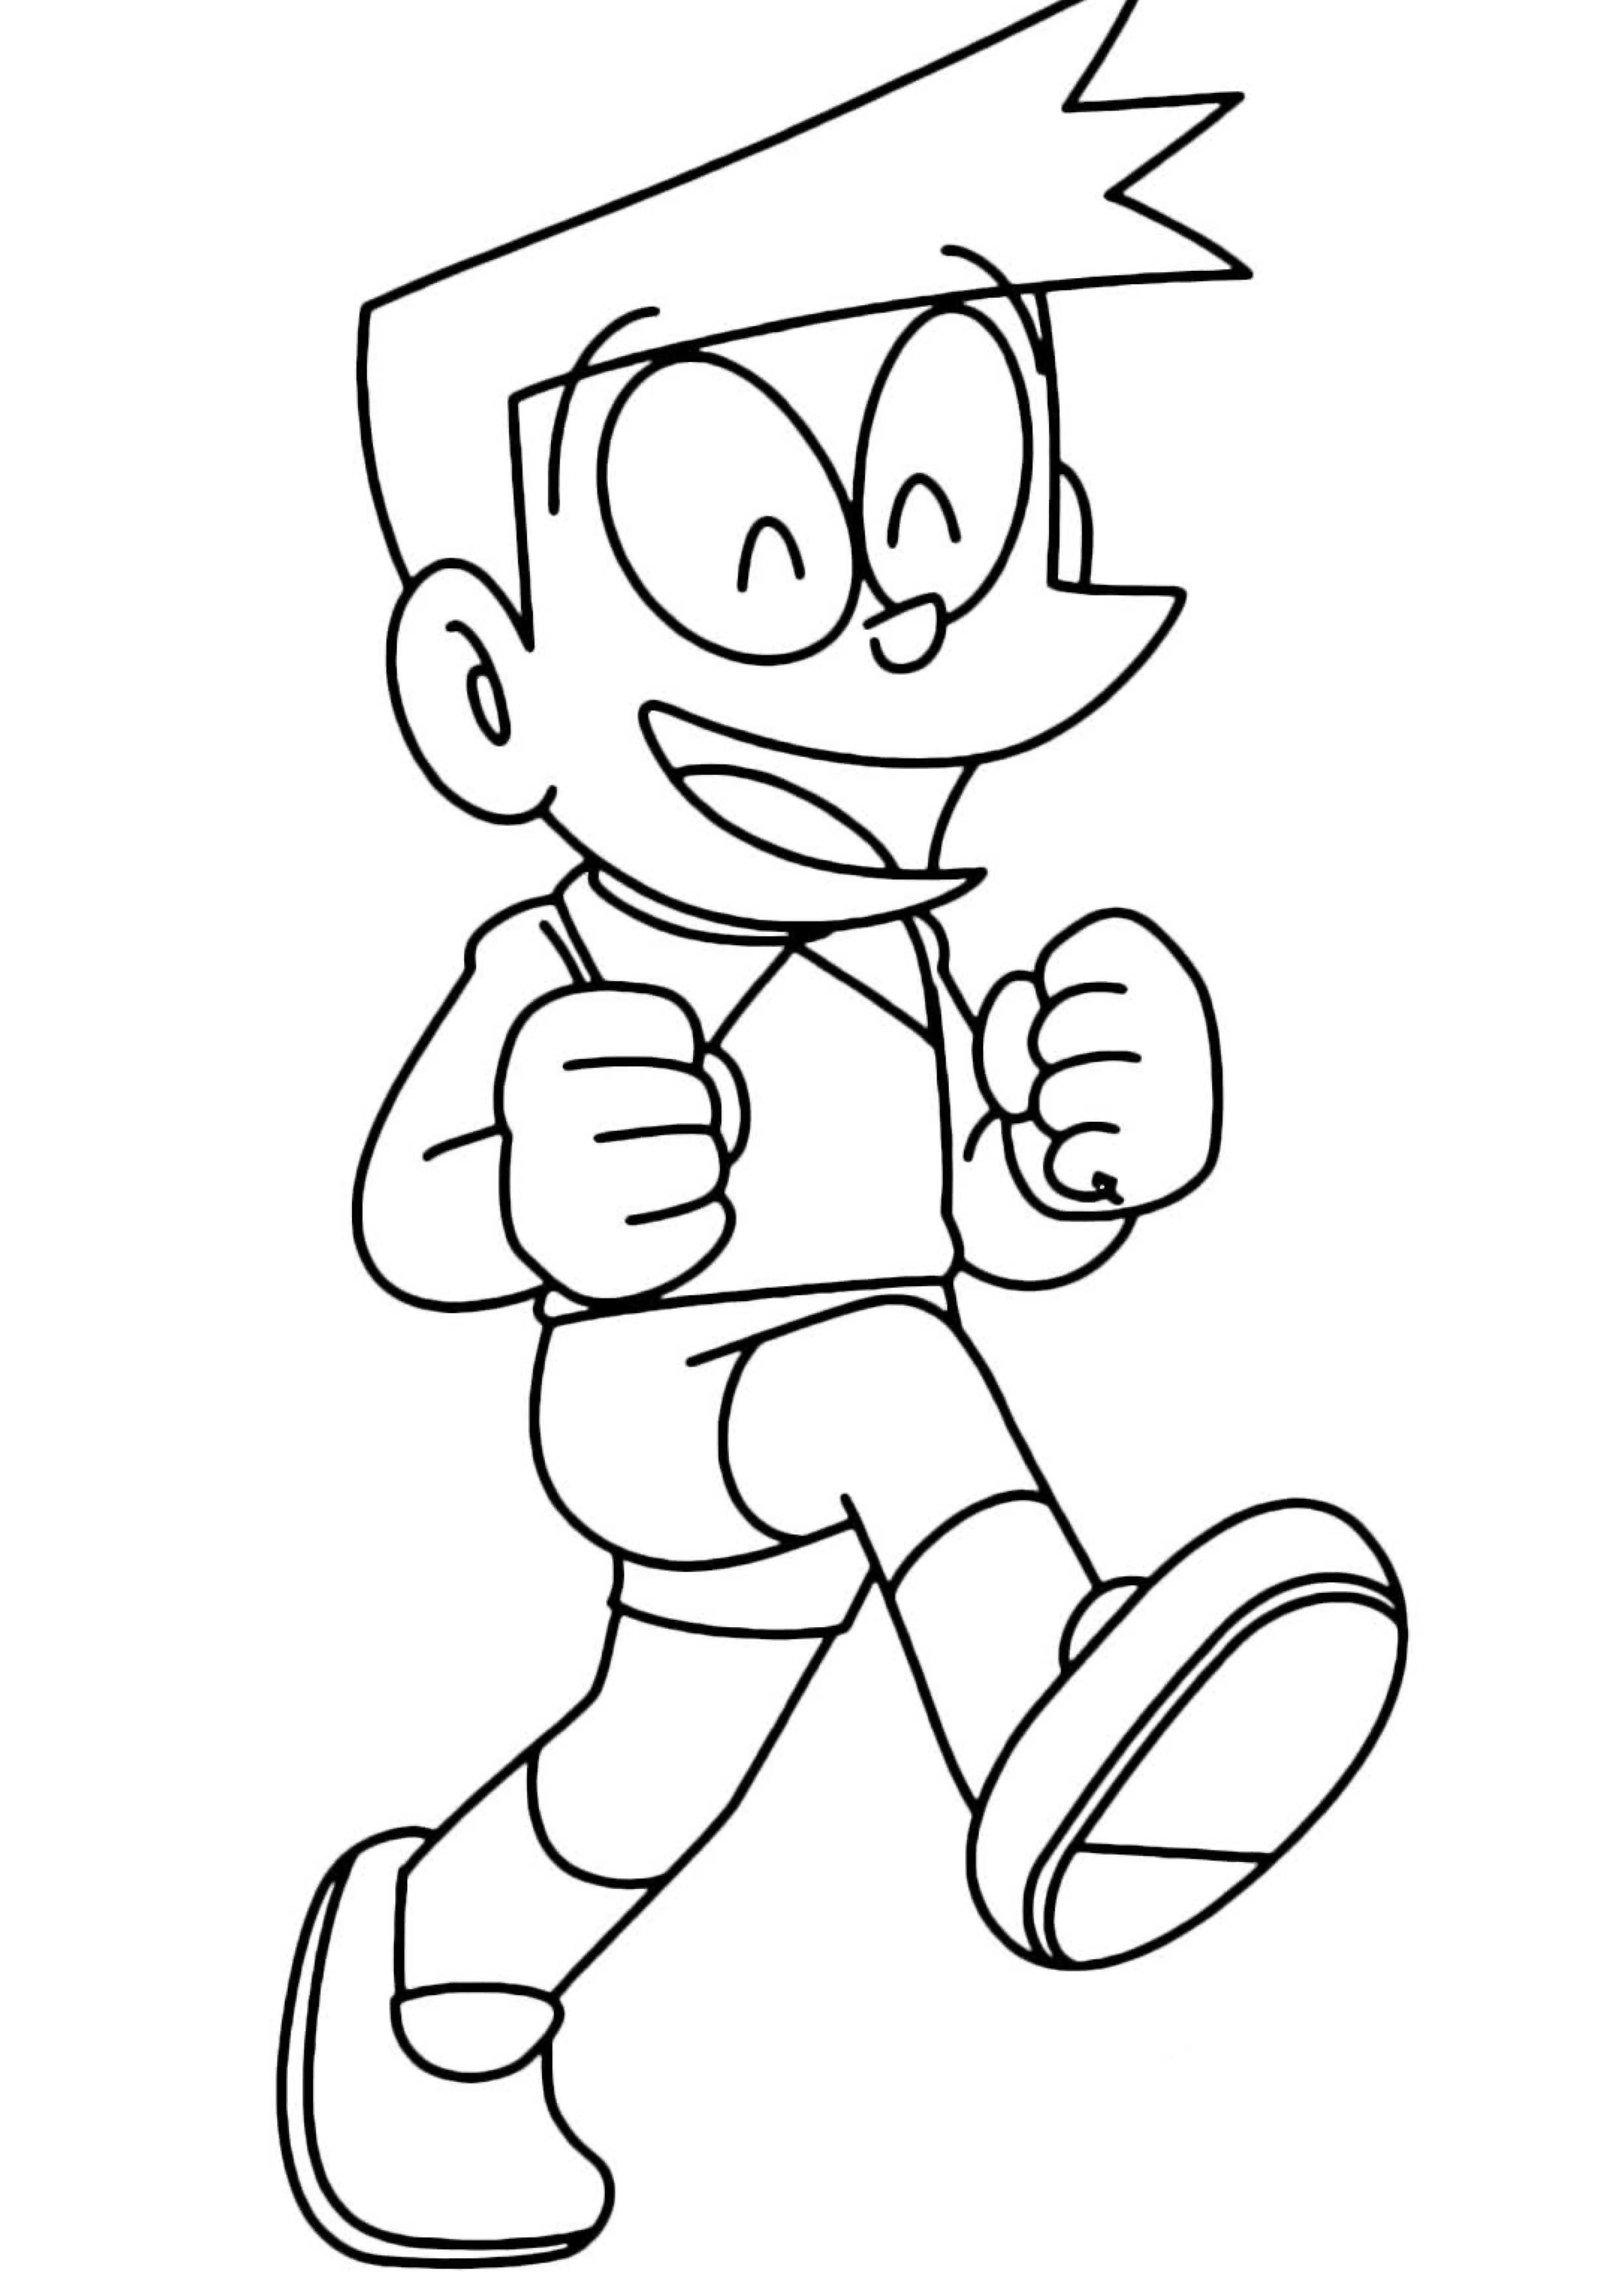 Doraemon-27